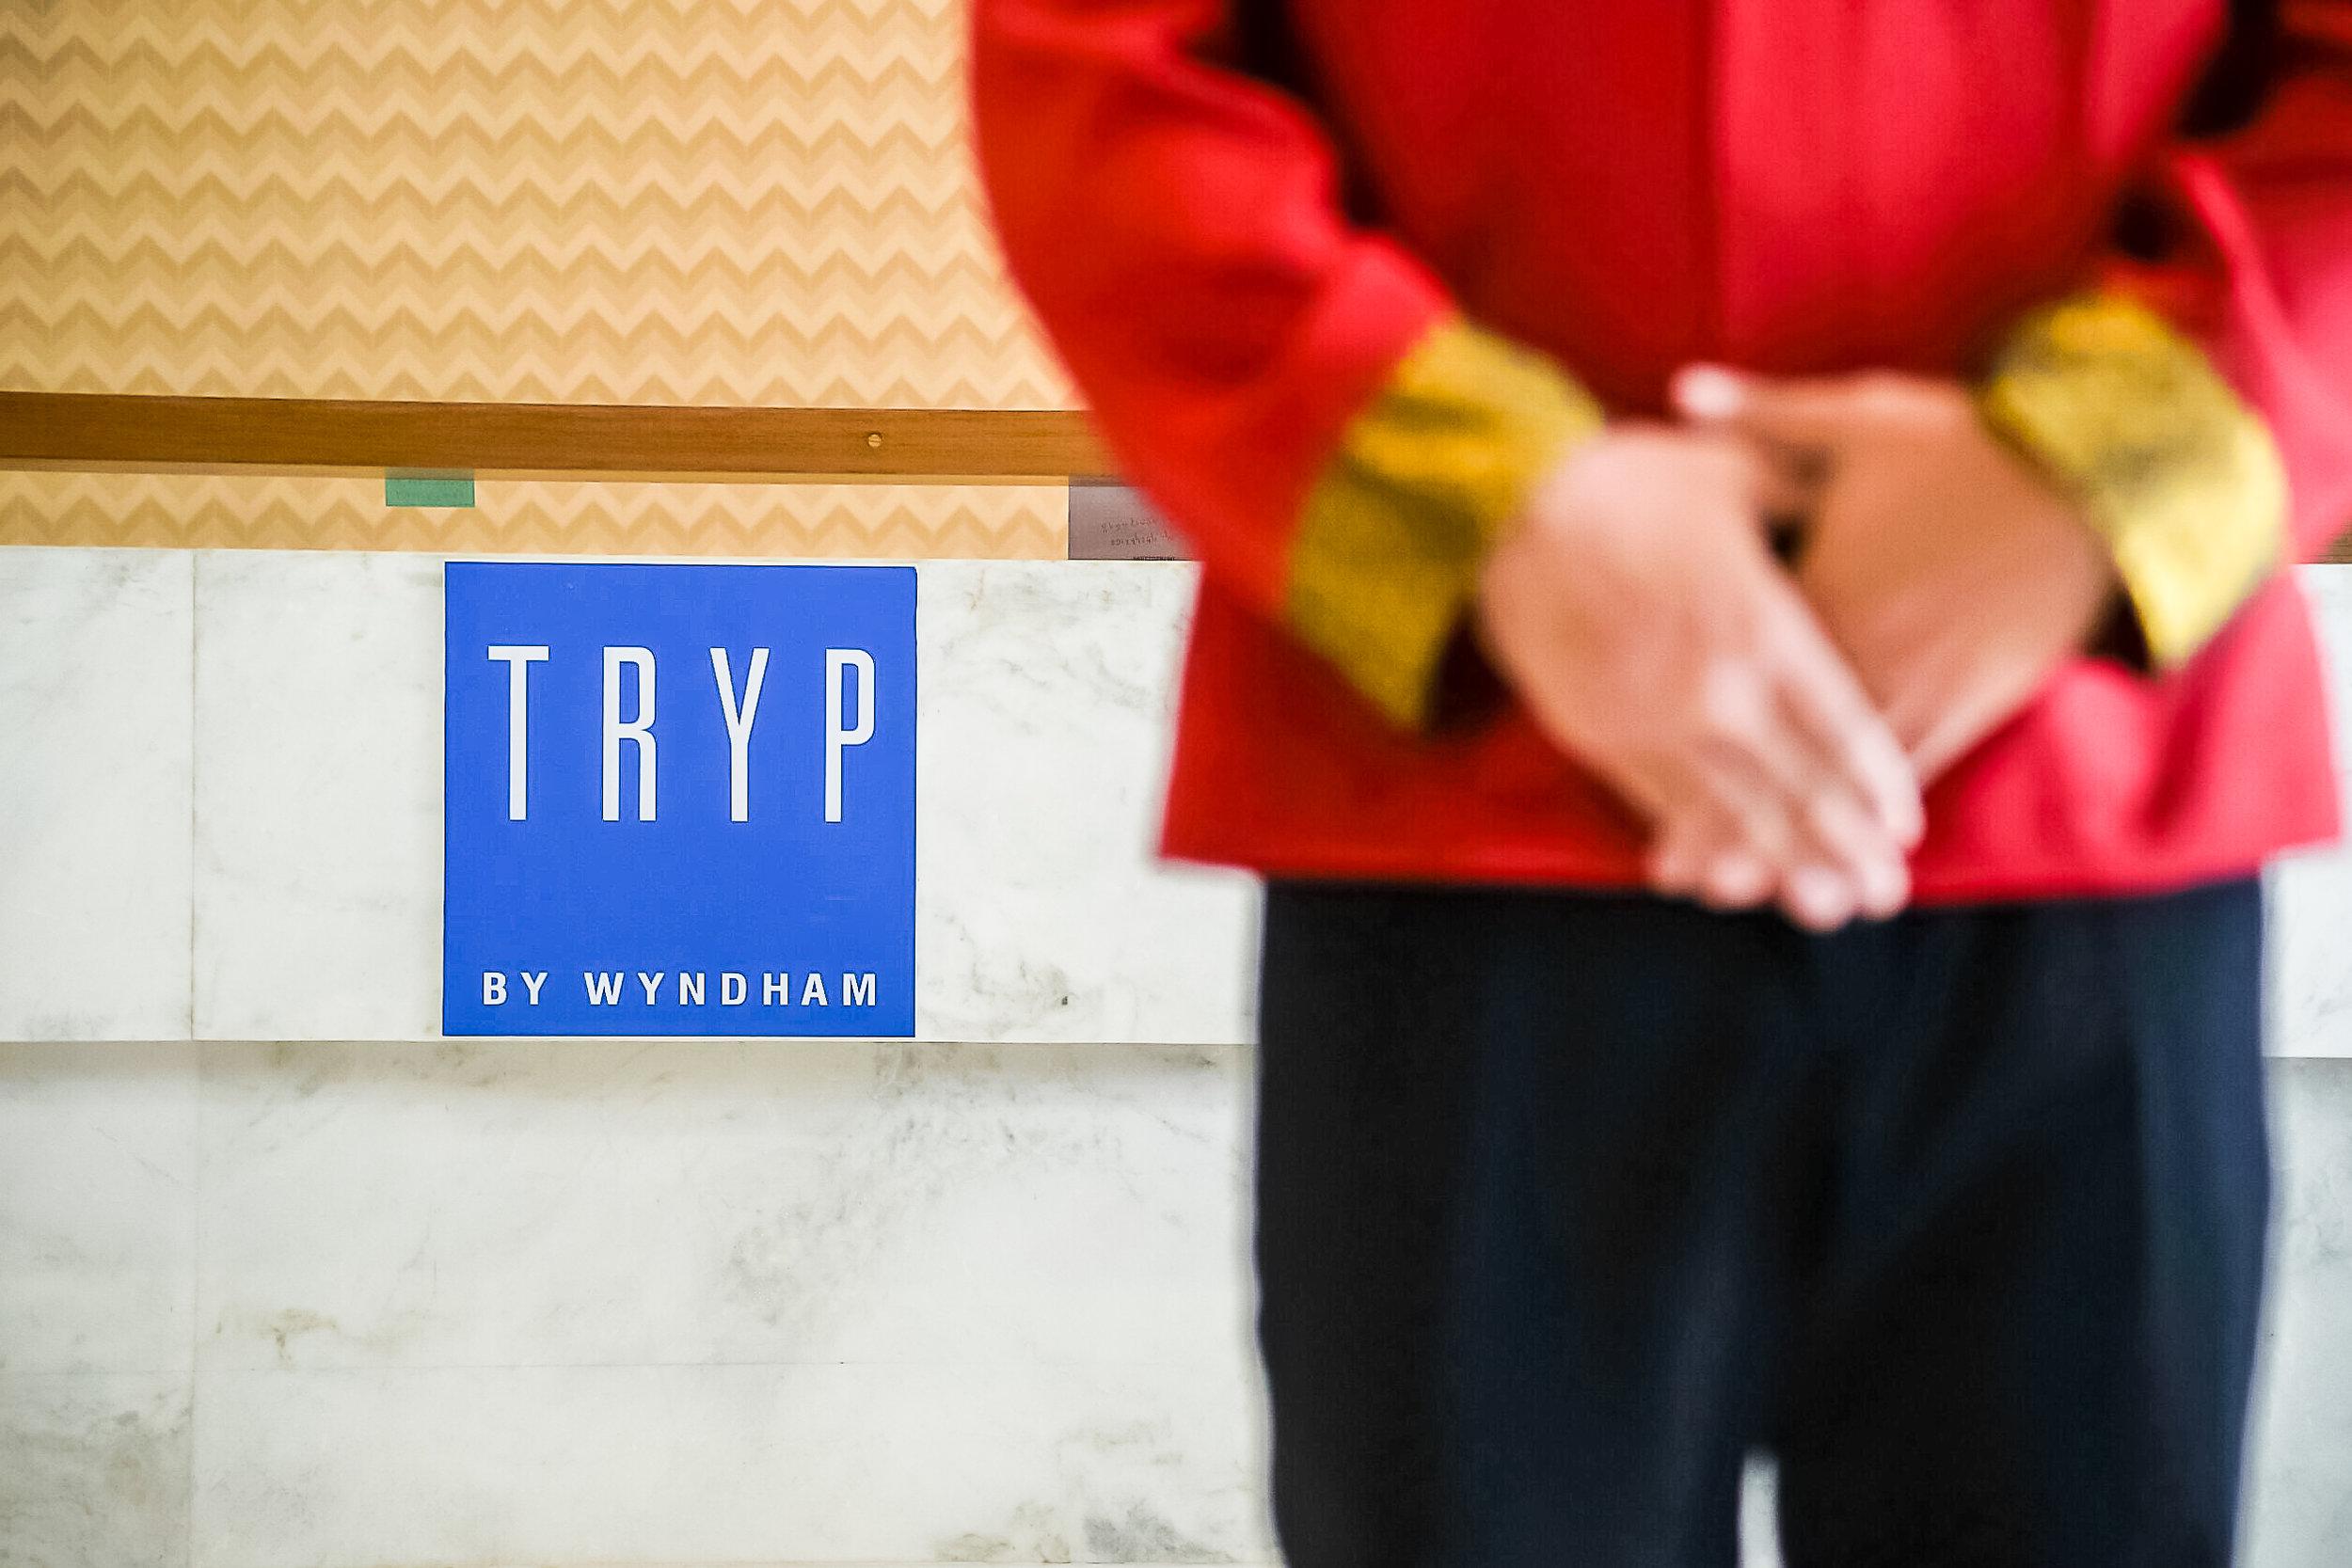 TRYP by Wyndham Hotel Group   Photo Credit: Wyndham Hotel Group